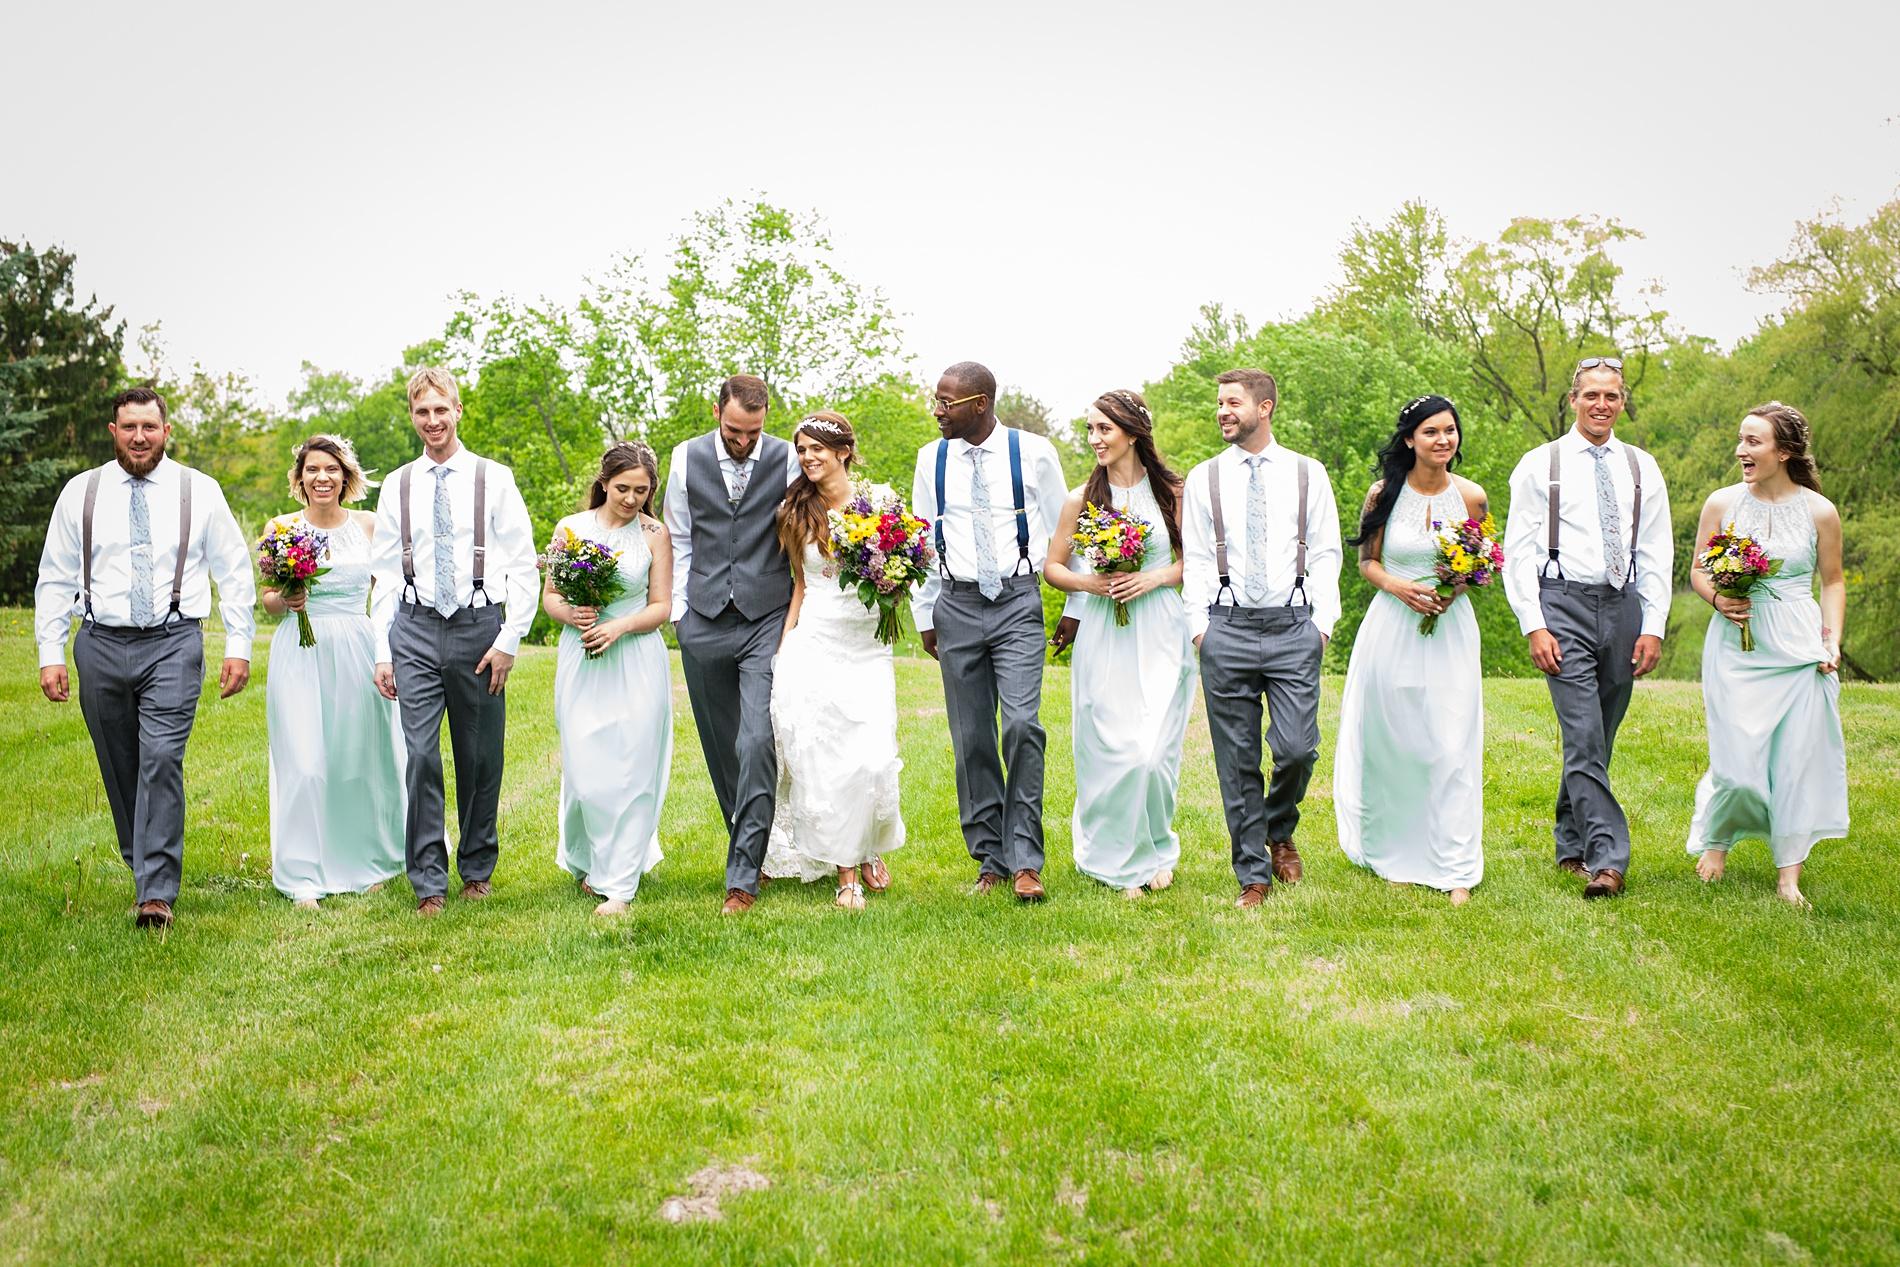 Brandon_Shafer_Photography_Brett_Autumn_Wedding_0052.jpg